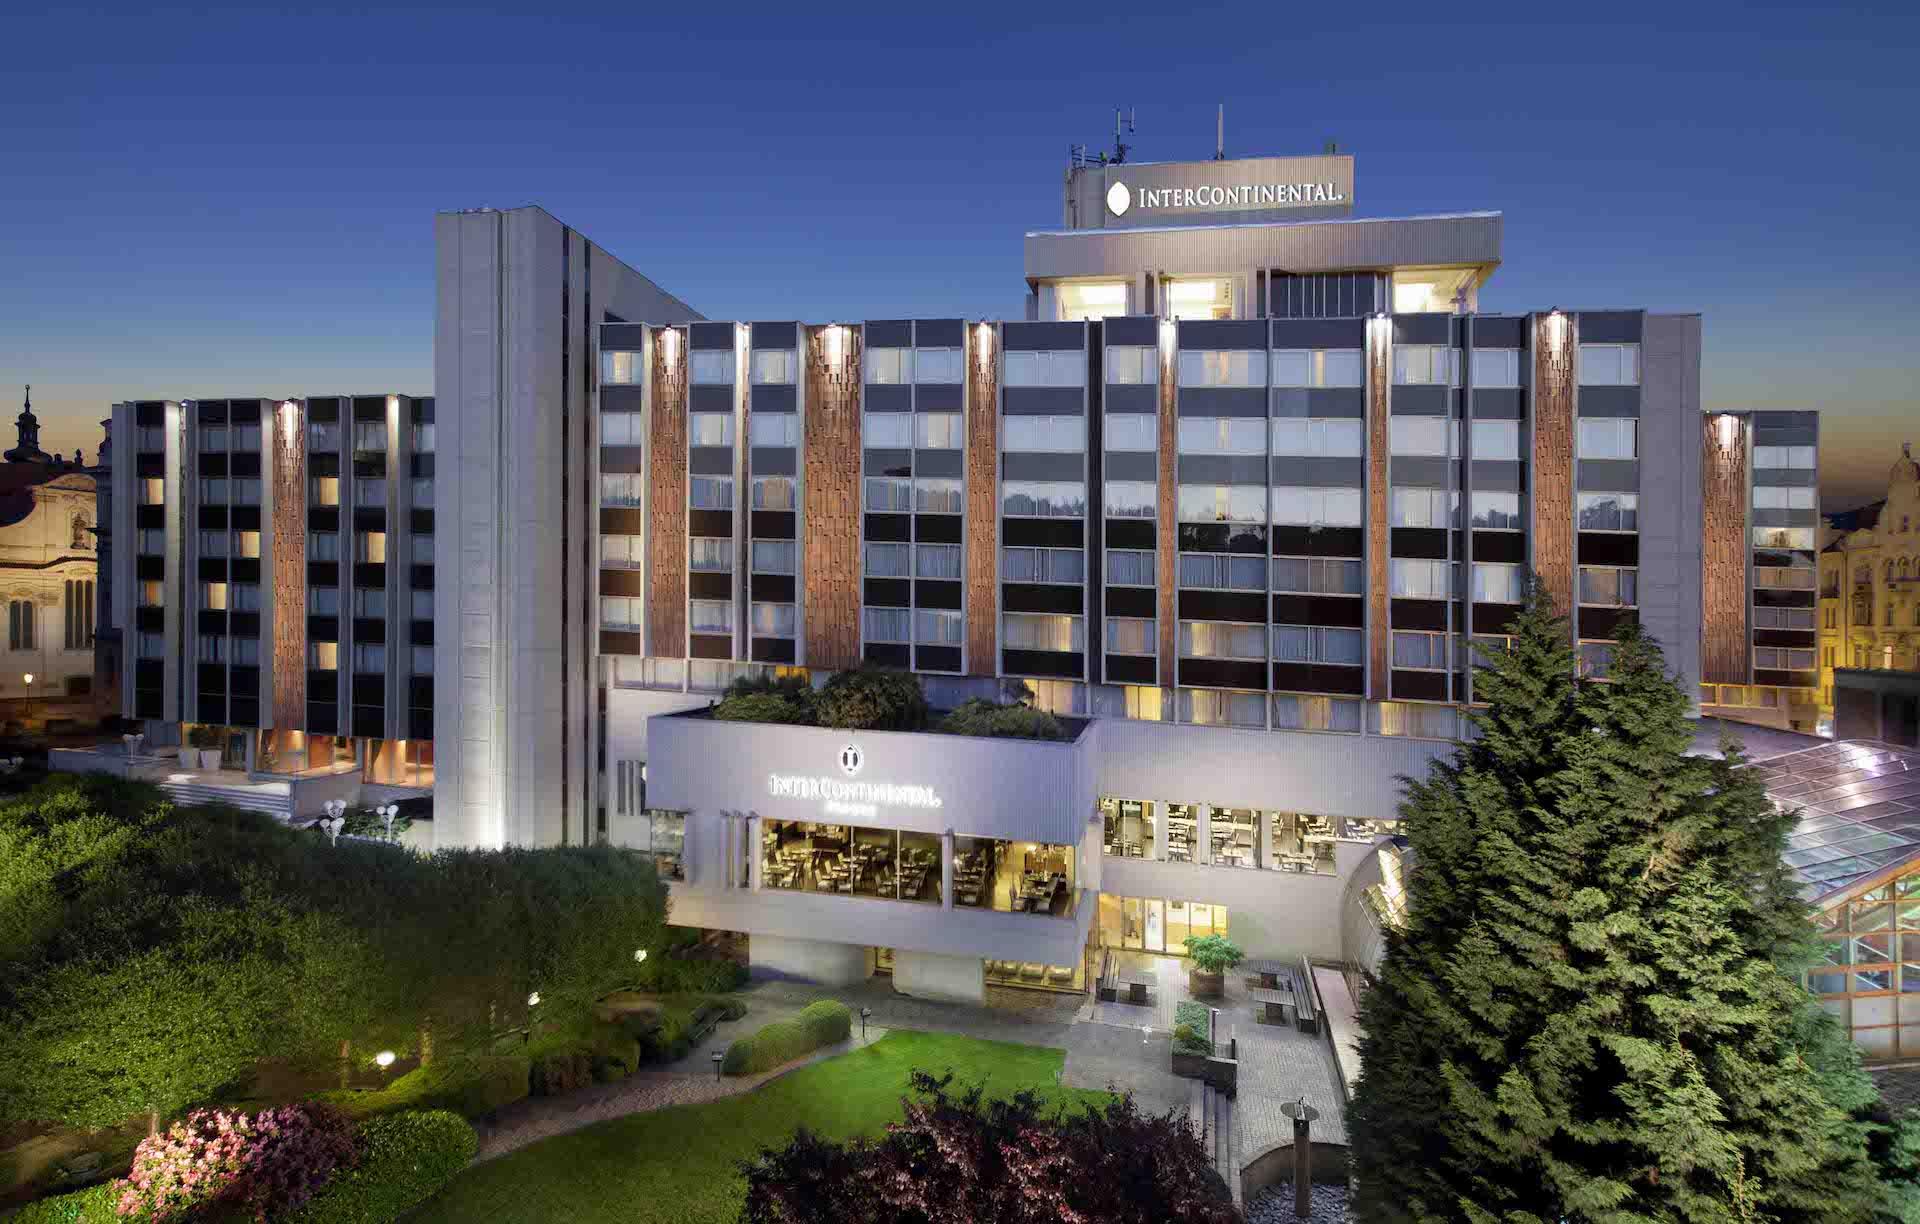 Hotel Intercontinental v Praze